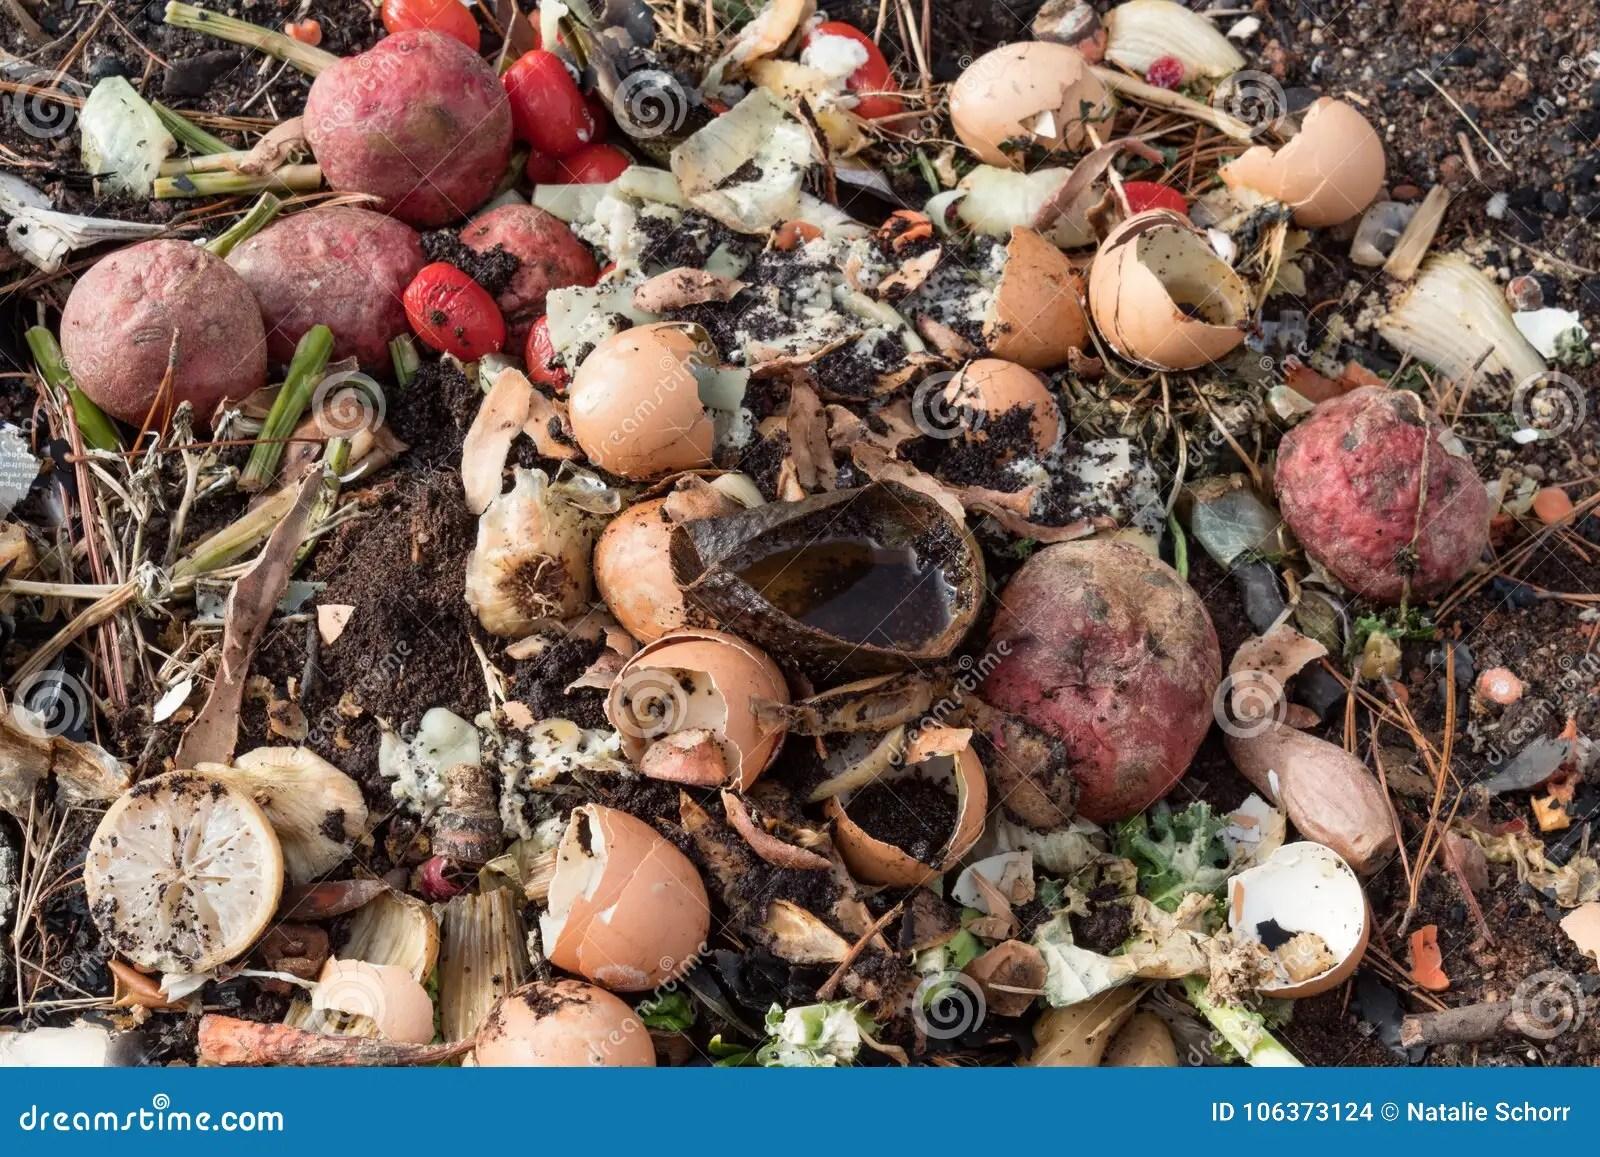 kitchen compost container water efficient faucet 堆肥腐朽的厨房水果和蔬菜小块堆库存照片 图片包括有方面 有机 杉木 堆肥腐朽的厨房t和菜小块 水平的方面堆